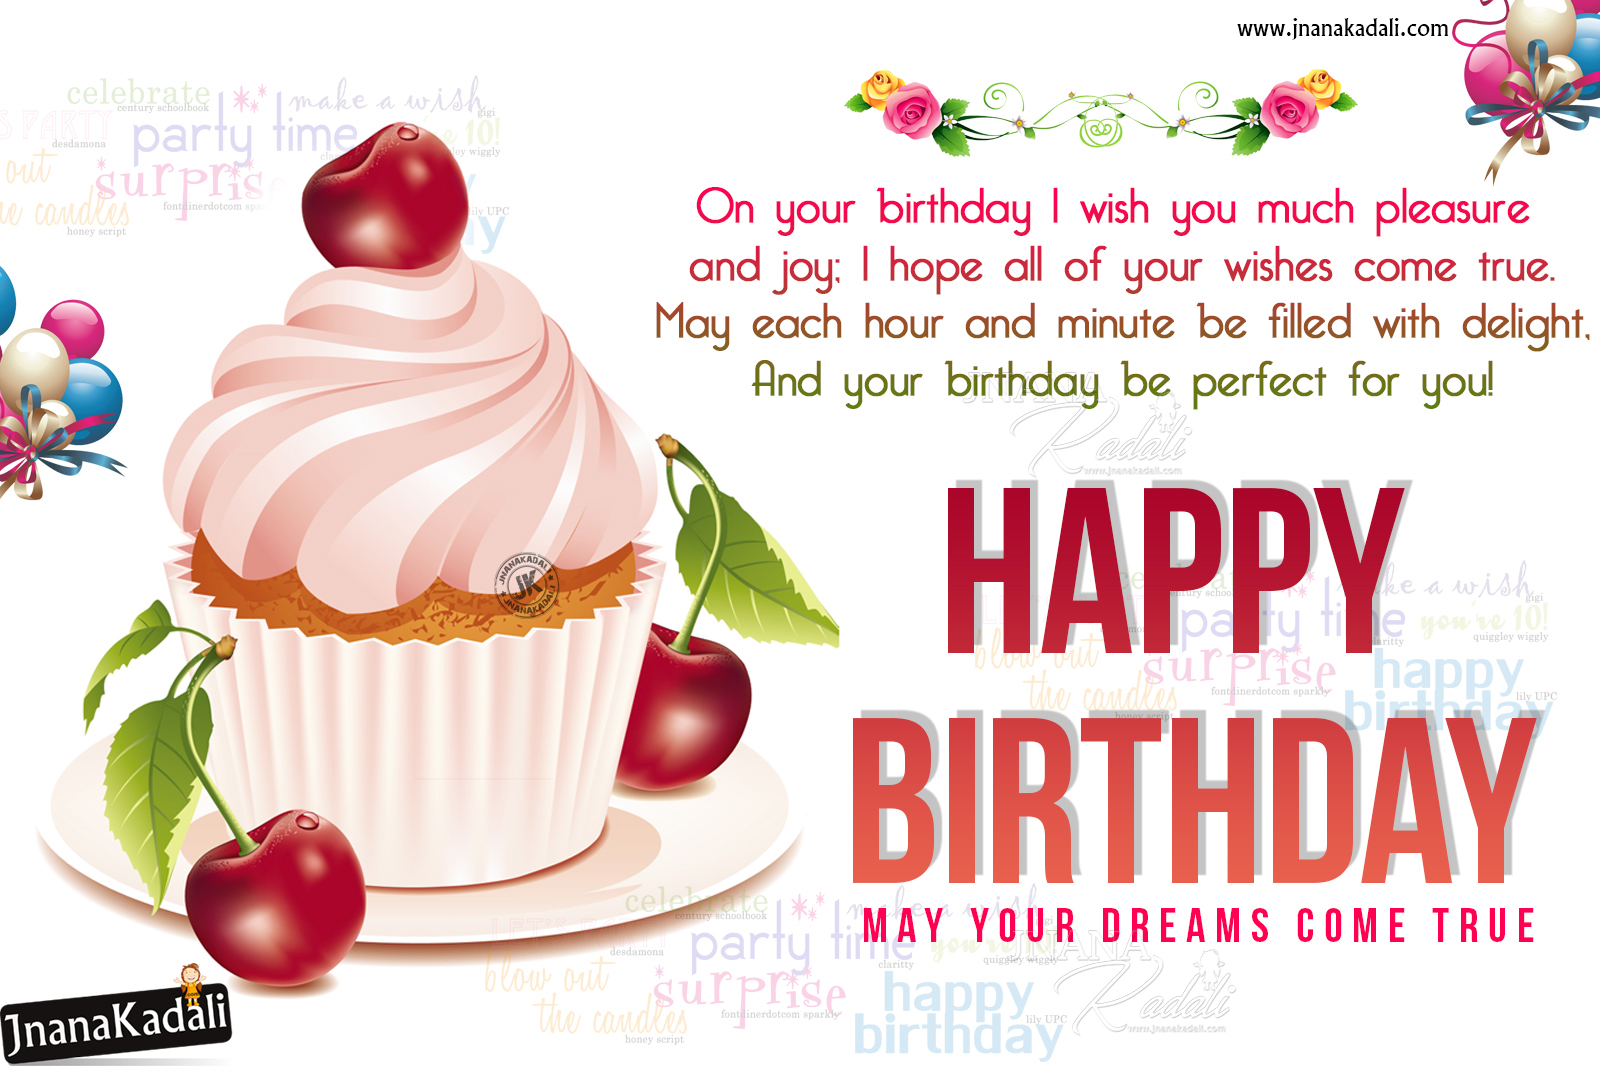 Happy Birthday Greetings In English Birthday Whats App Sharing Greetings Free Download Jnana Kadali Com Telugu Quotes English Quotes Hindi Quotes Tamil Quotes Dharmasandehalu